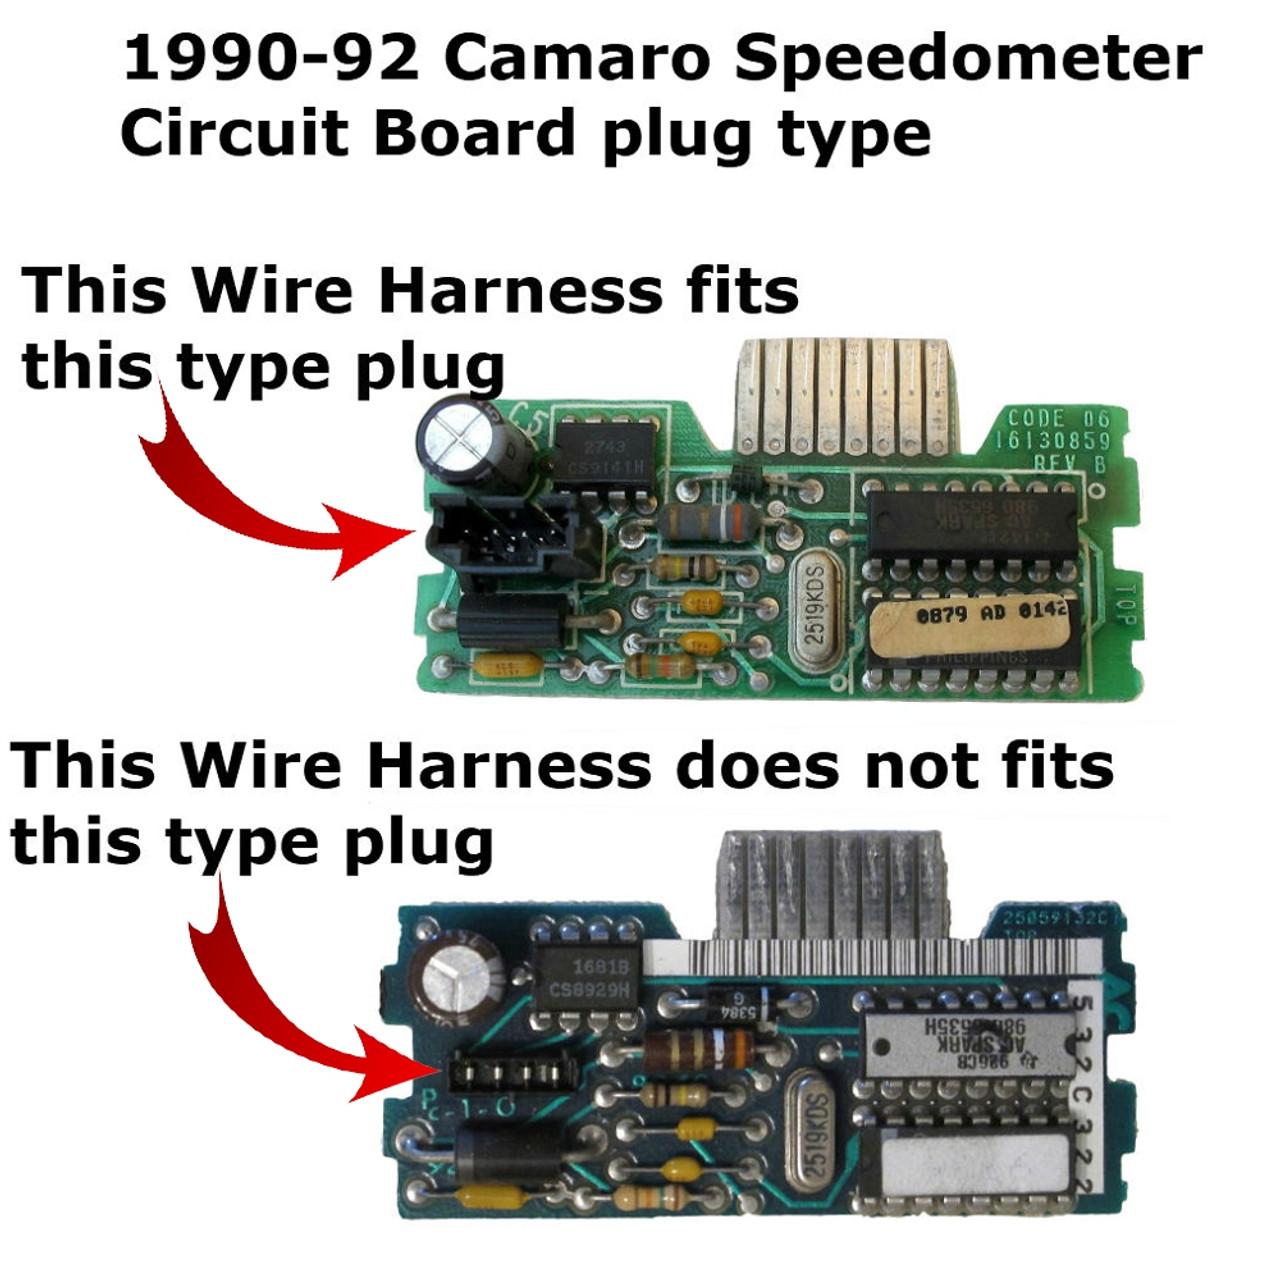 medium resolution of 1990 92 chevy camaro speedometer wire harness plug type 2 1990 92 chevy camaro speedometer